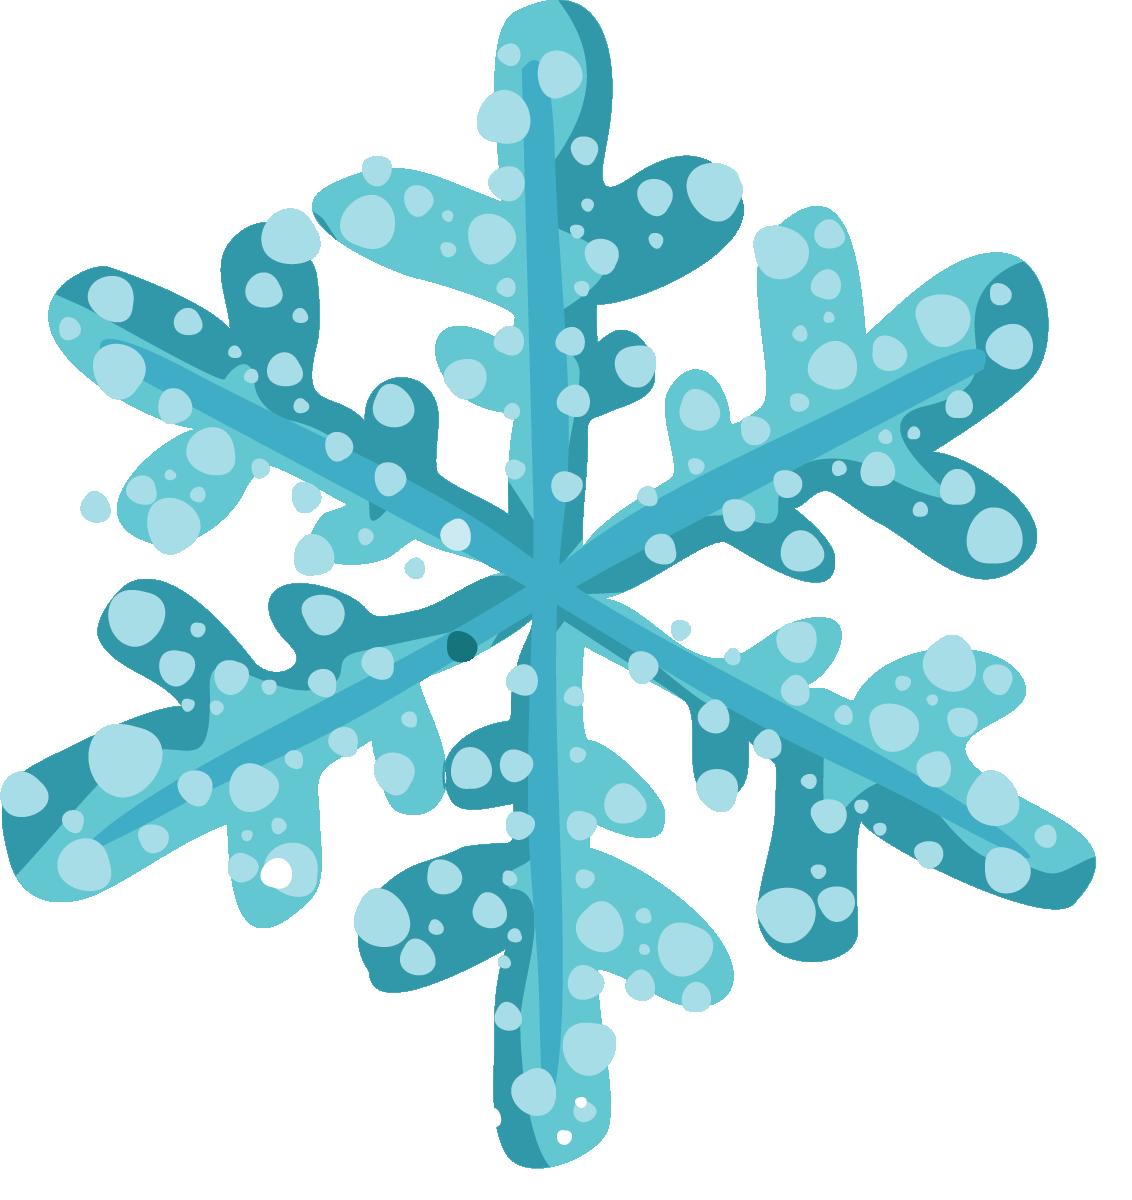 Snowflake clipart microsoft 3